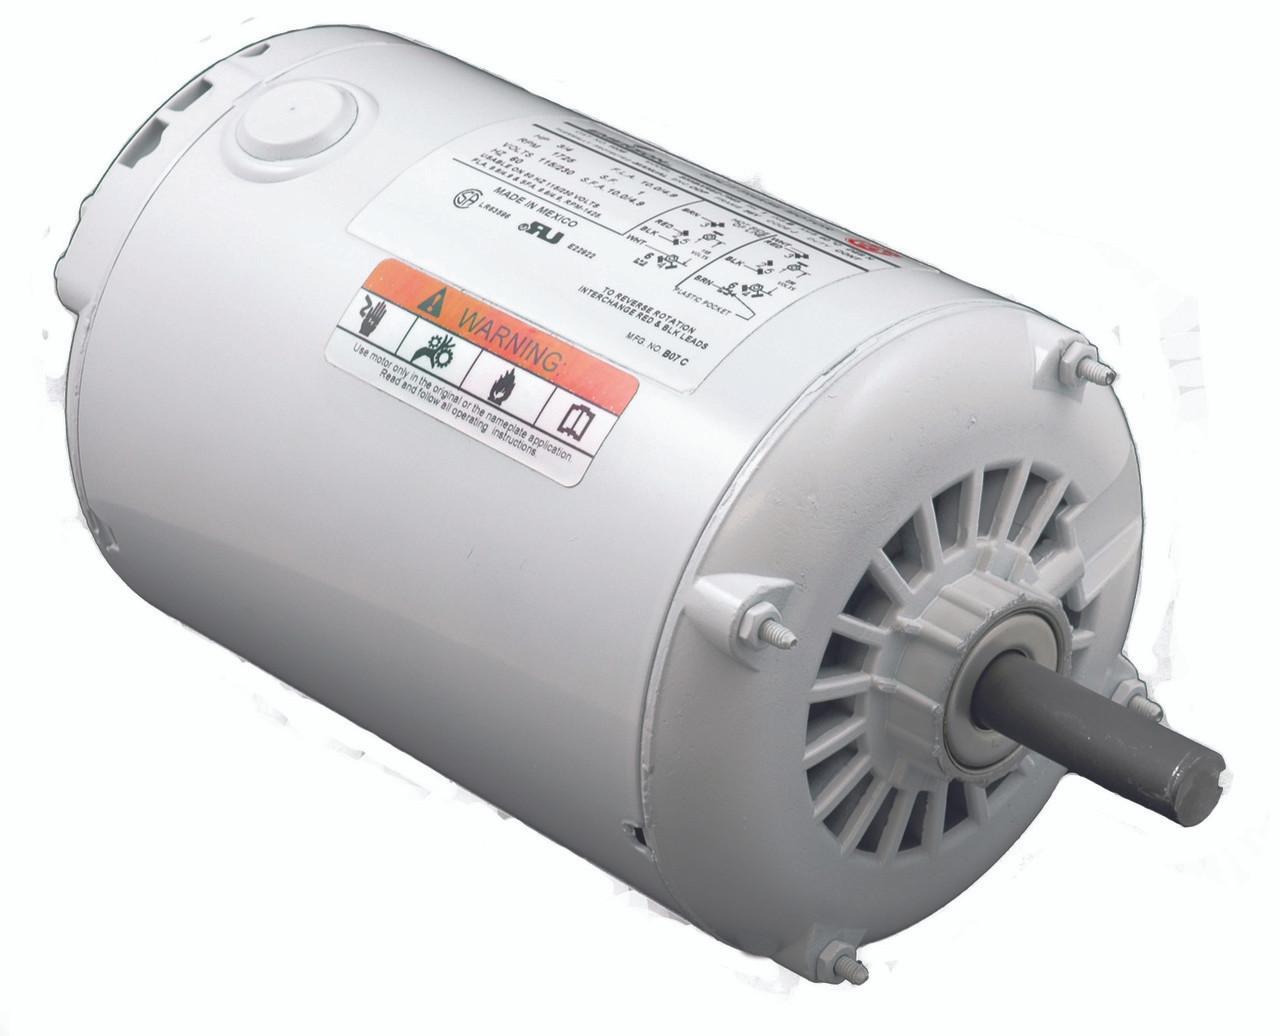 3/4 HP Electric Motor